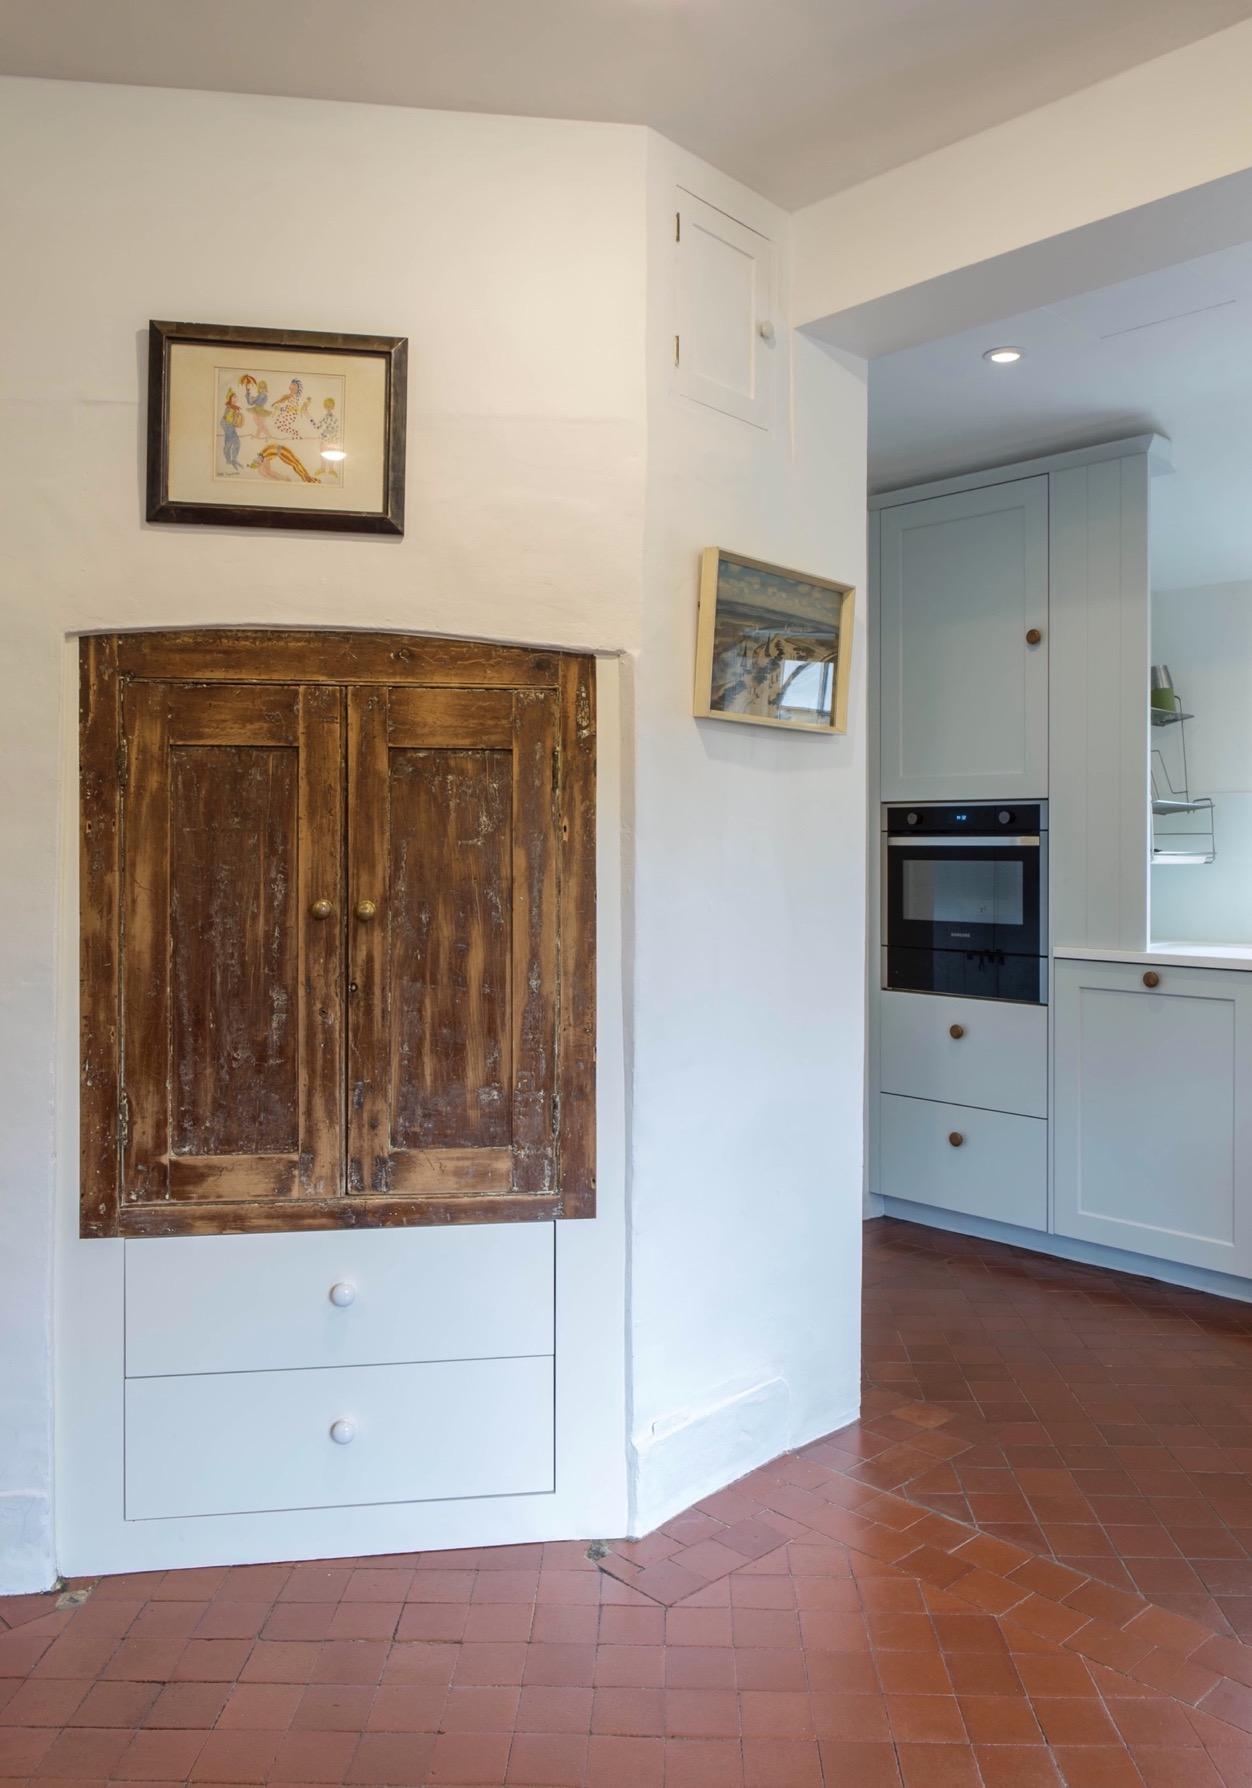 clever inset storage upcycled doors haddenham buckinghamshire bespoke kitchen